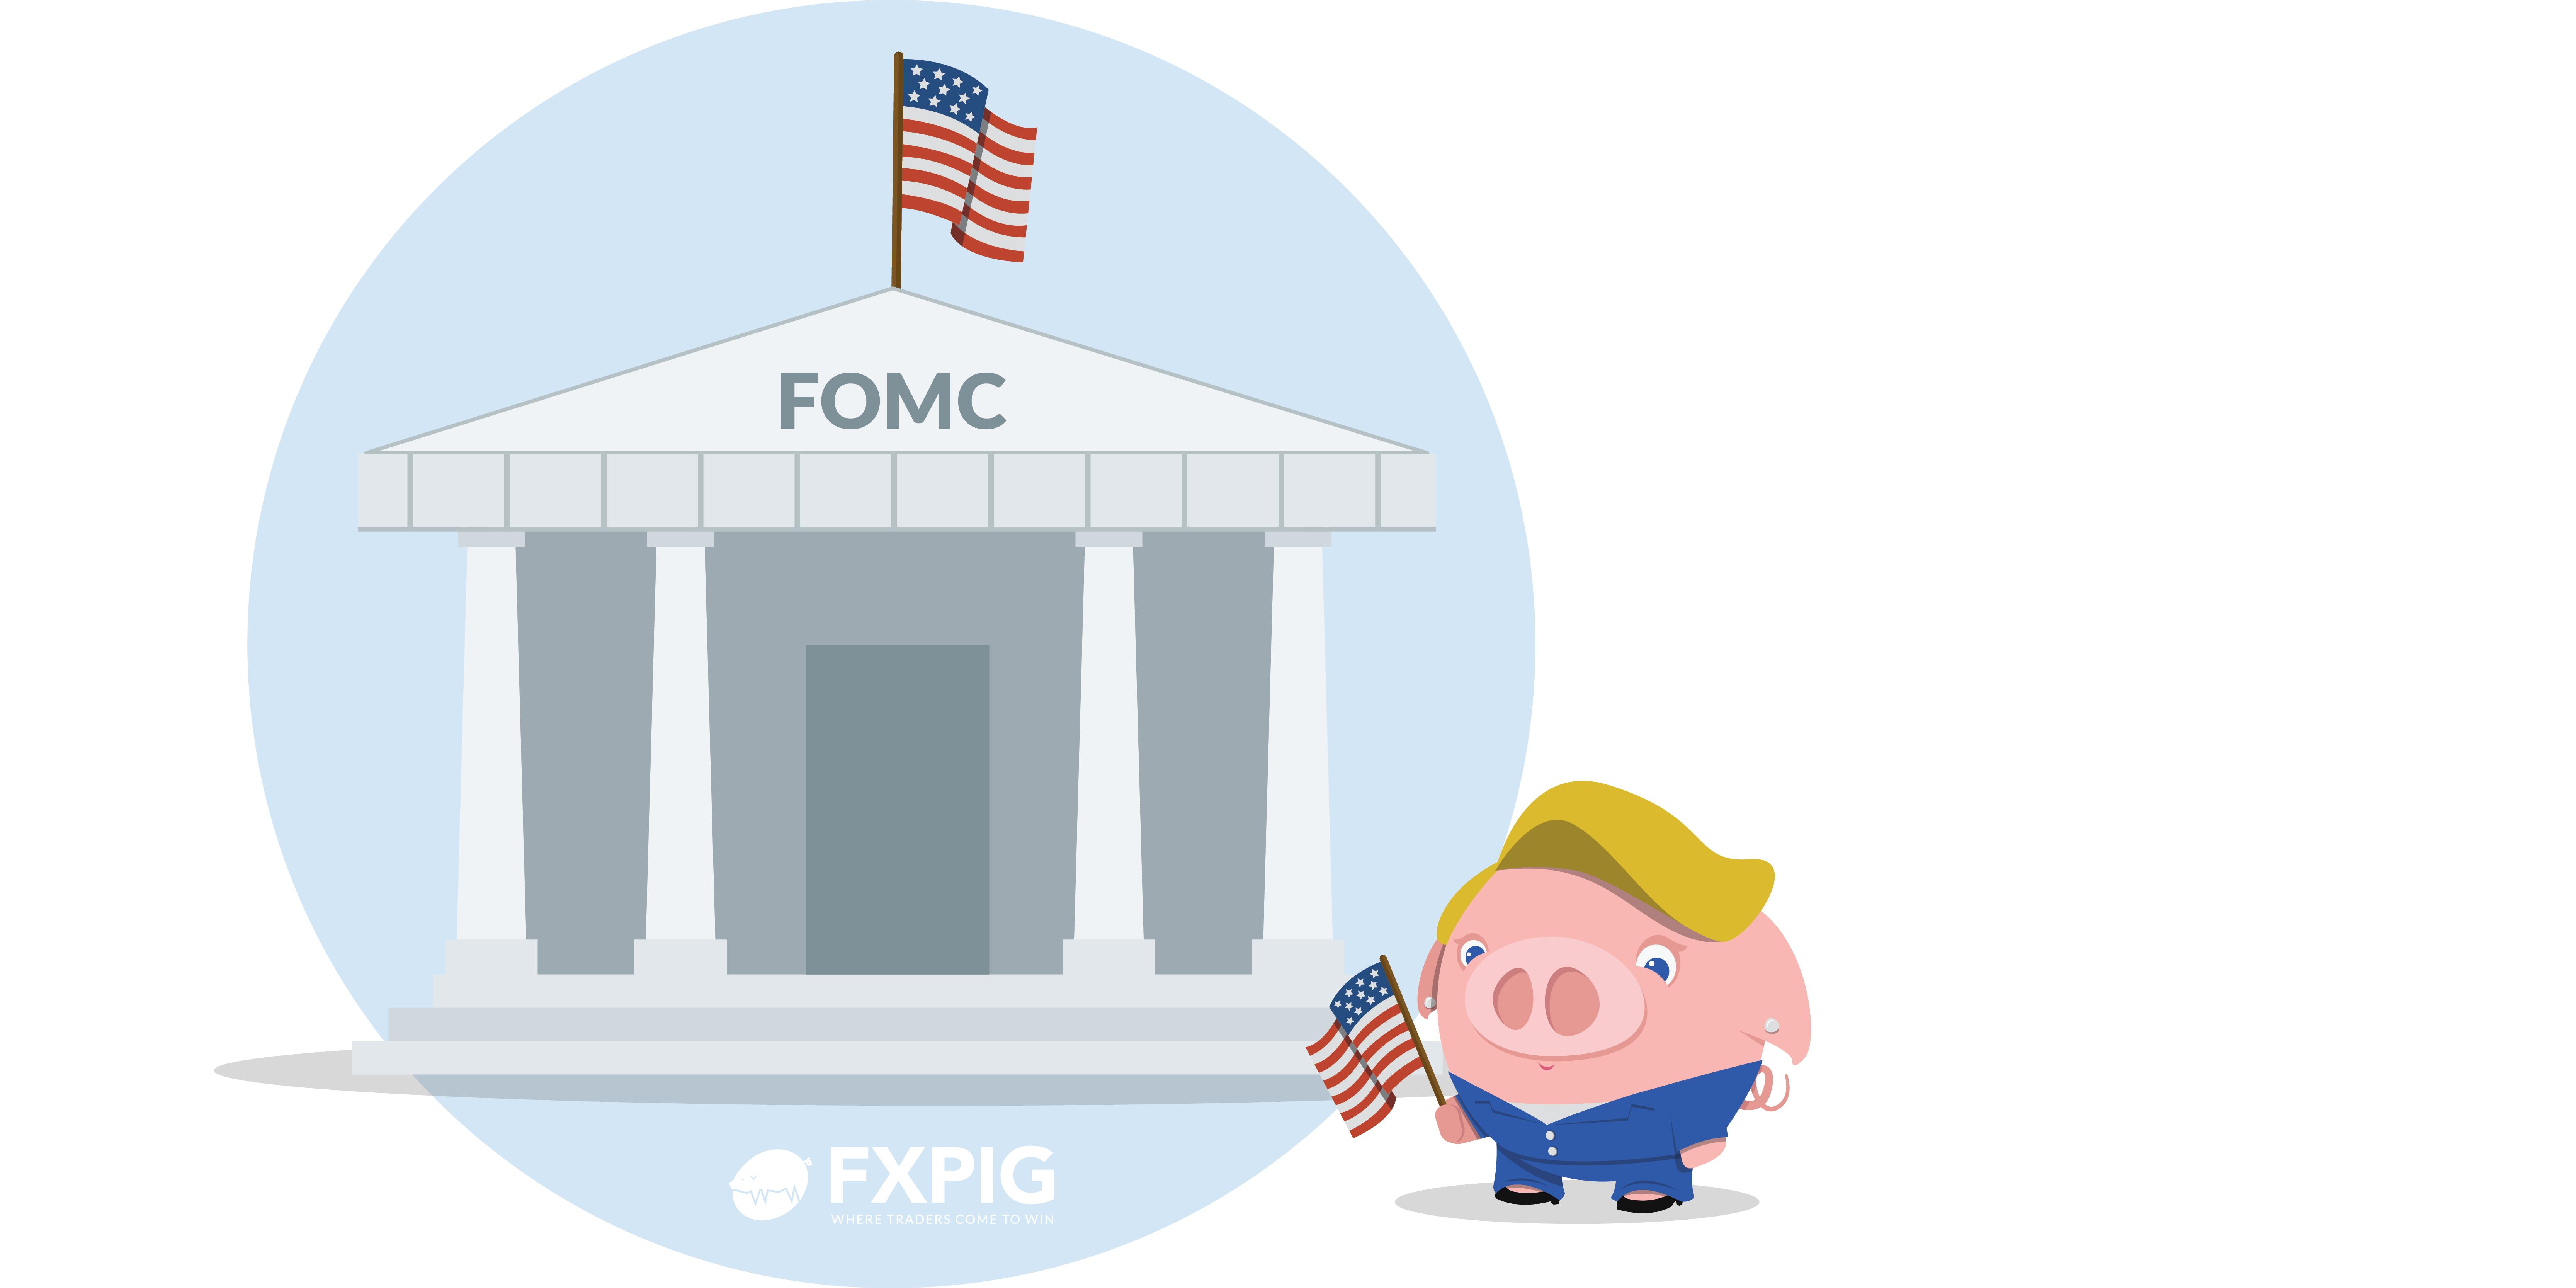 FOMC_still-no-pre-commitment_Forex_FXPIG